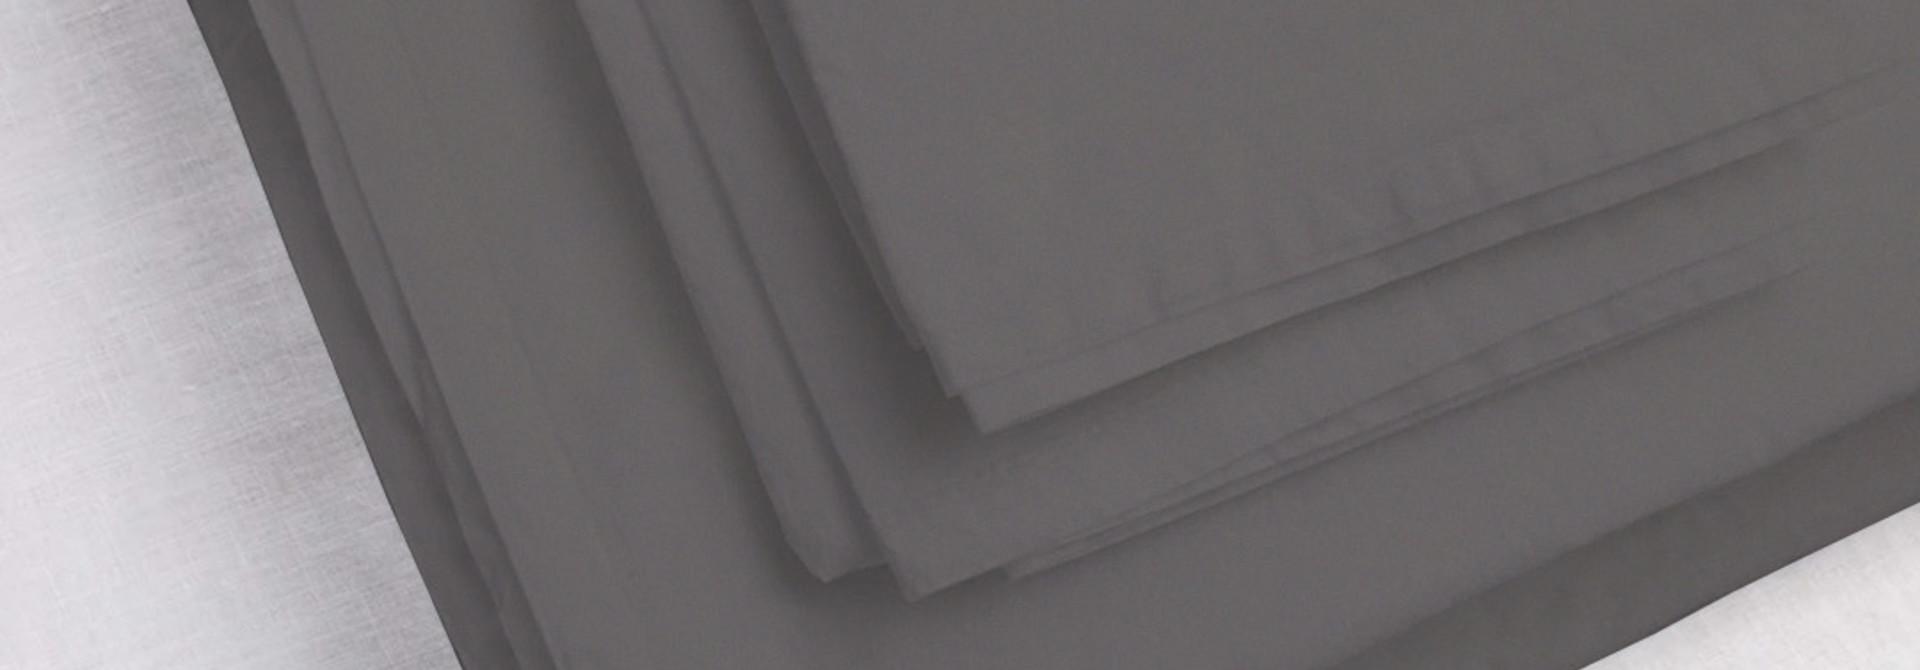 Pillowcase King - Coal - (1 P/c), (1Sham)